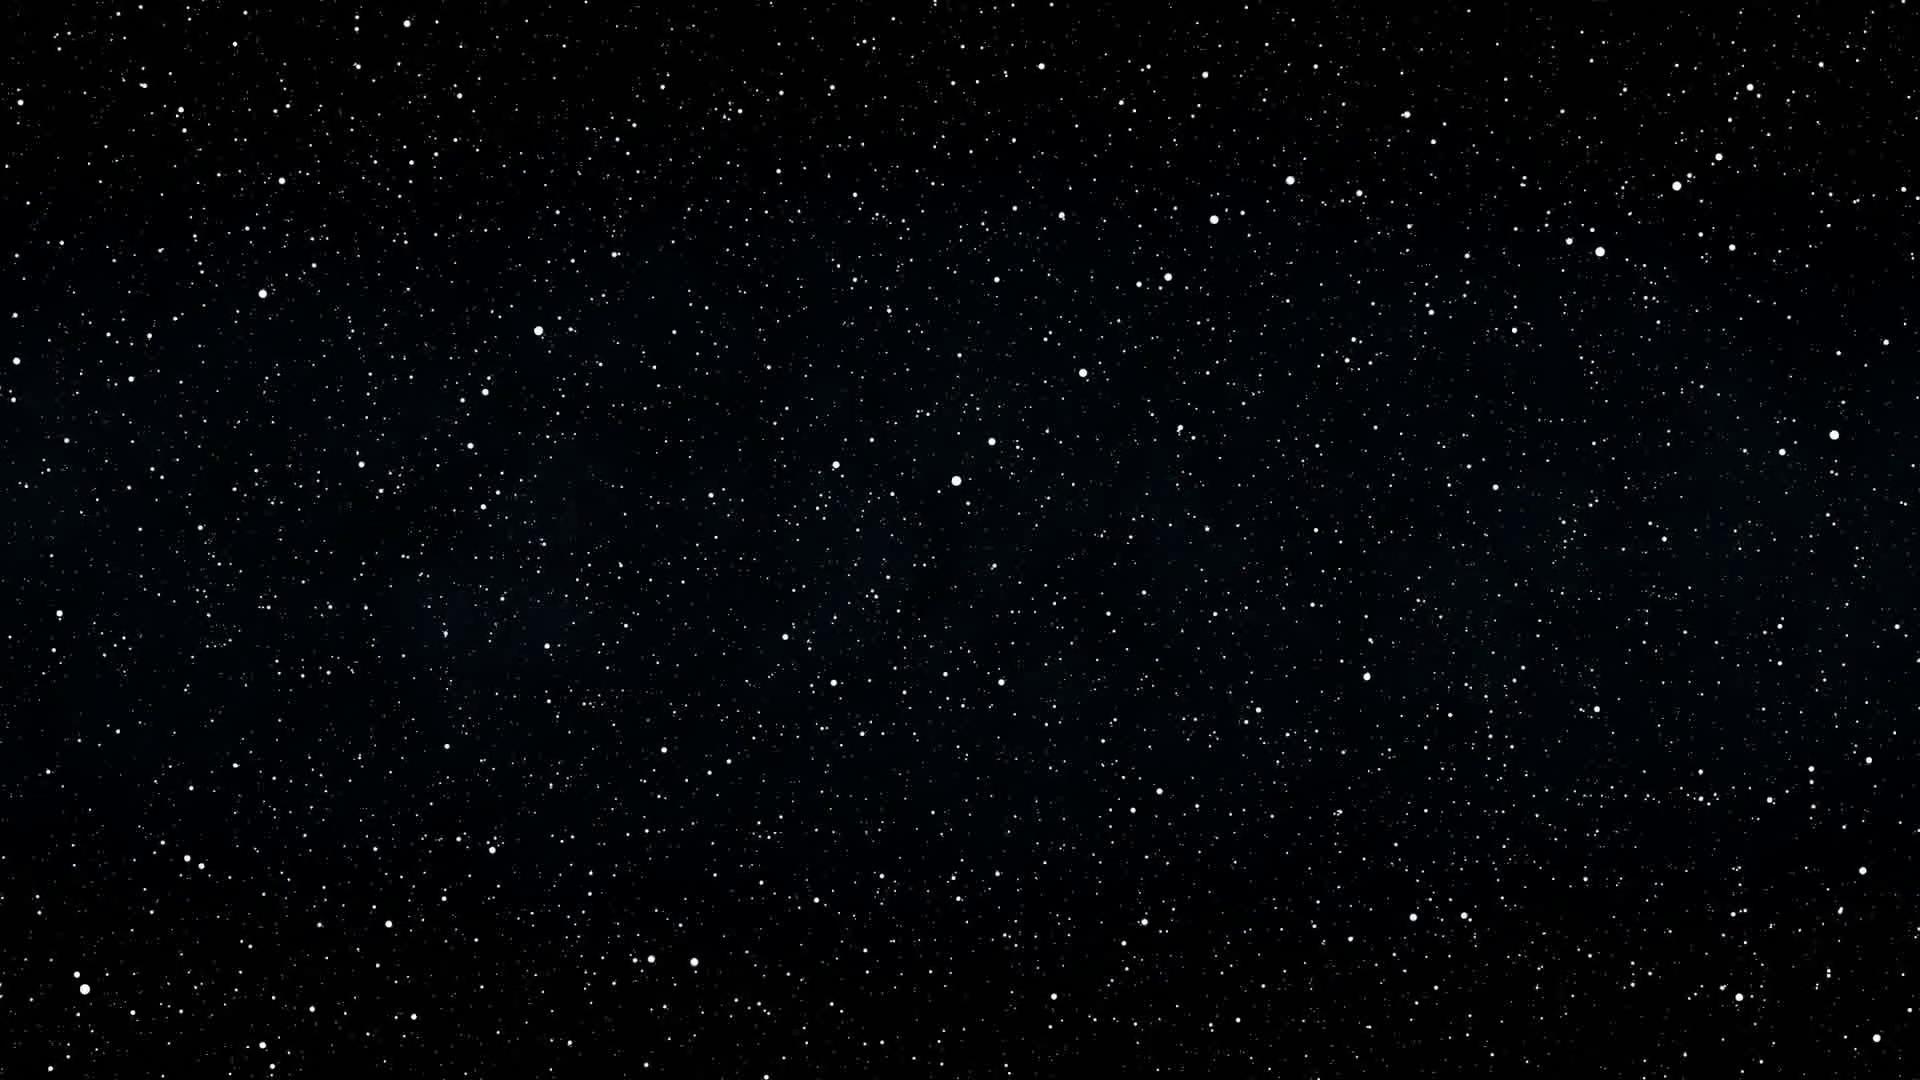 27 Star Wars Galaxies Background On Wallpapersafari